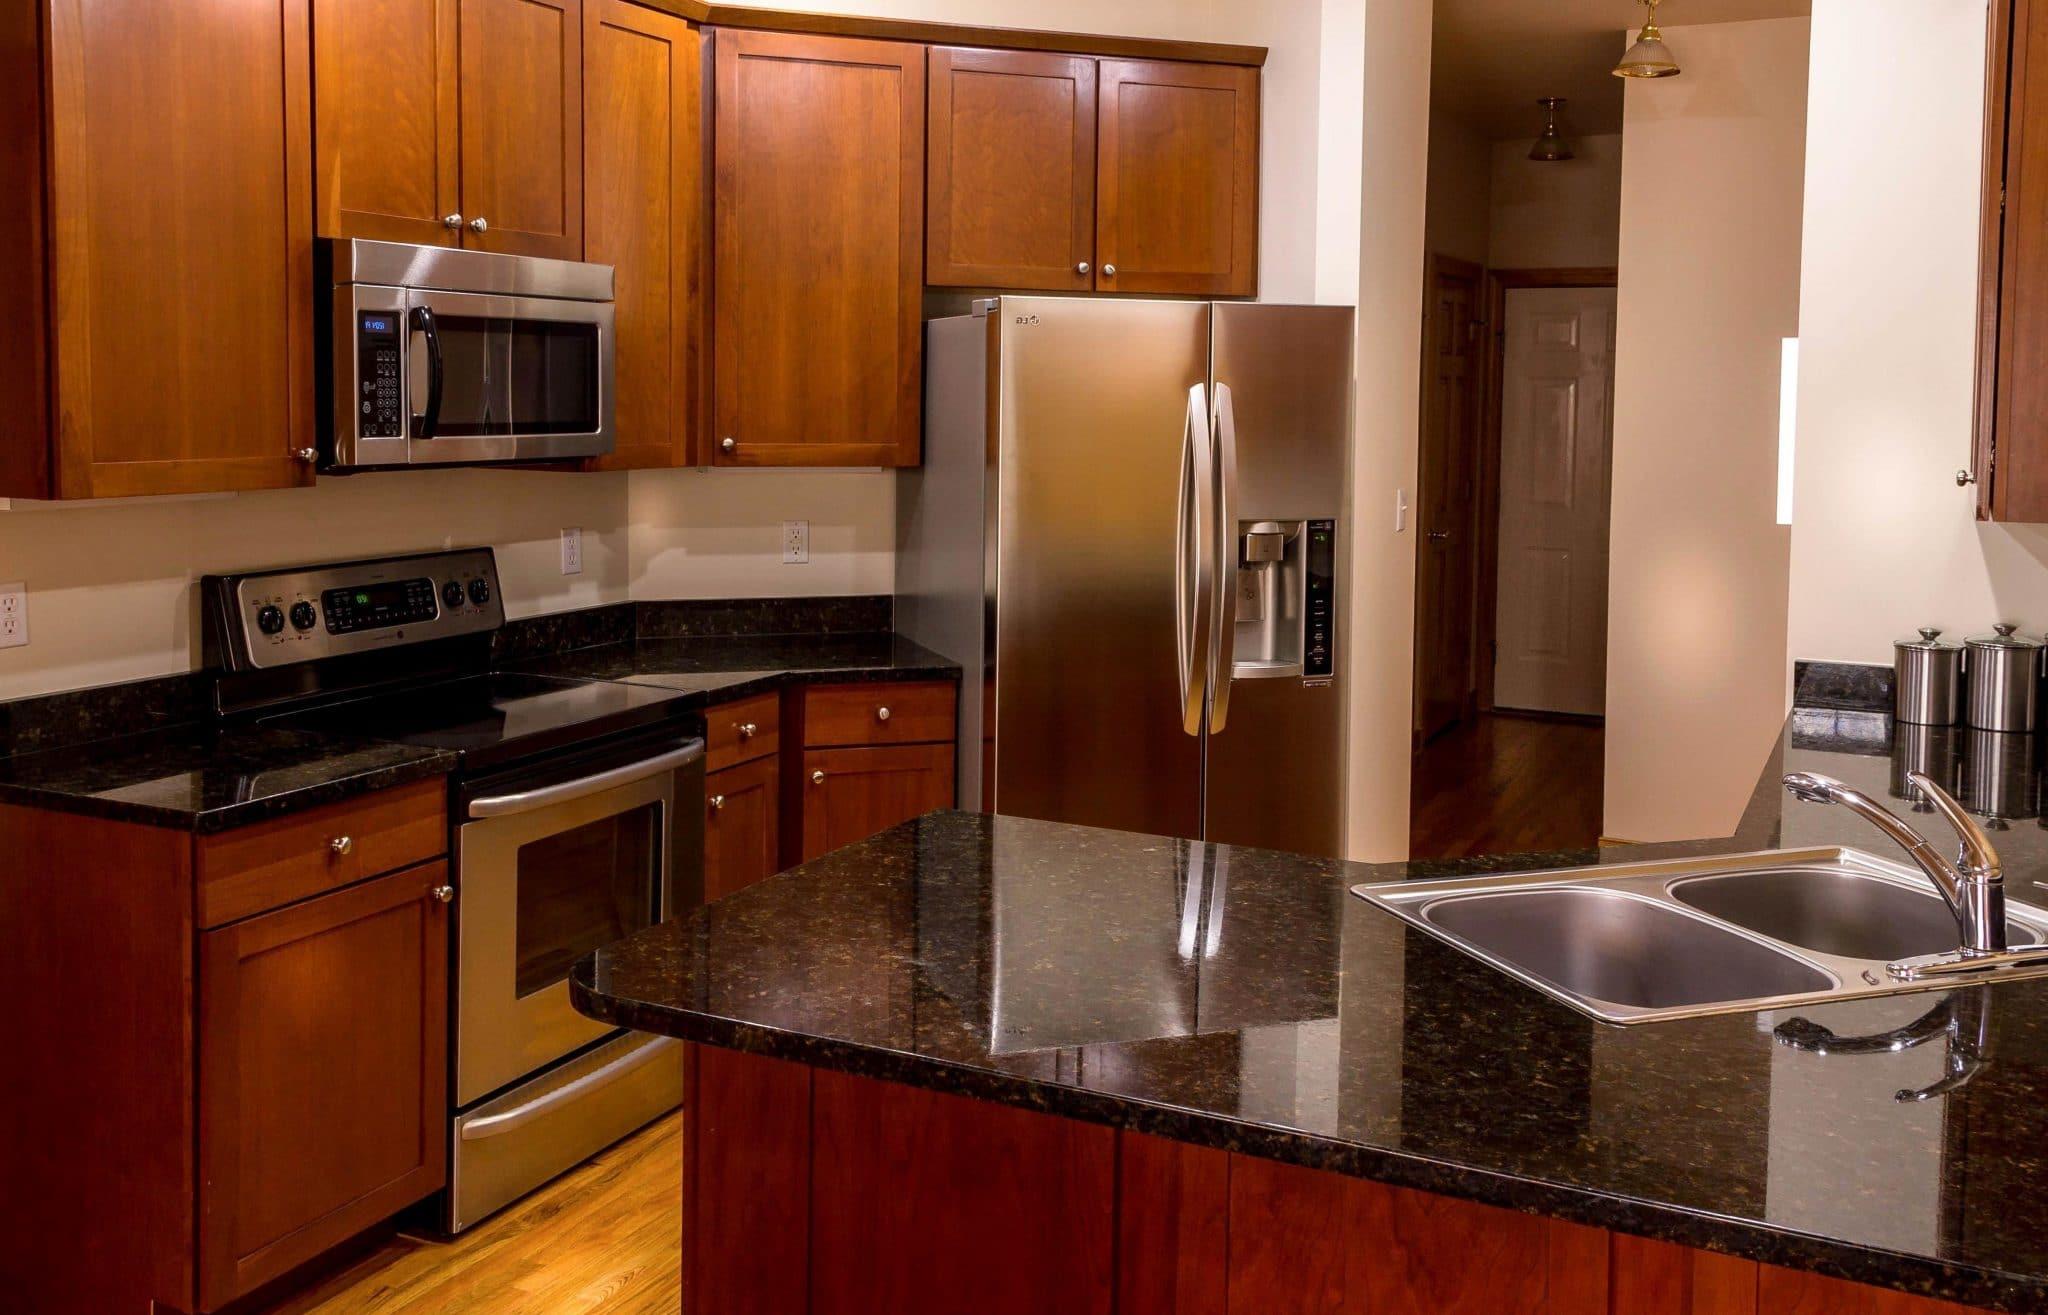 Best Side By Side Refrigerator Under 1000 Budget